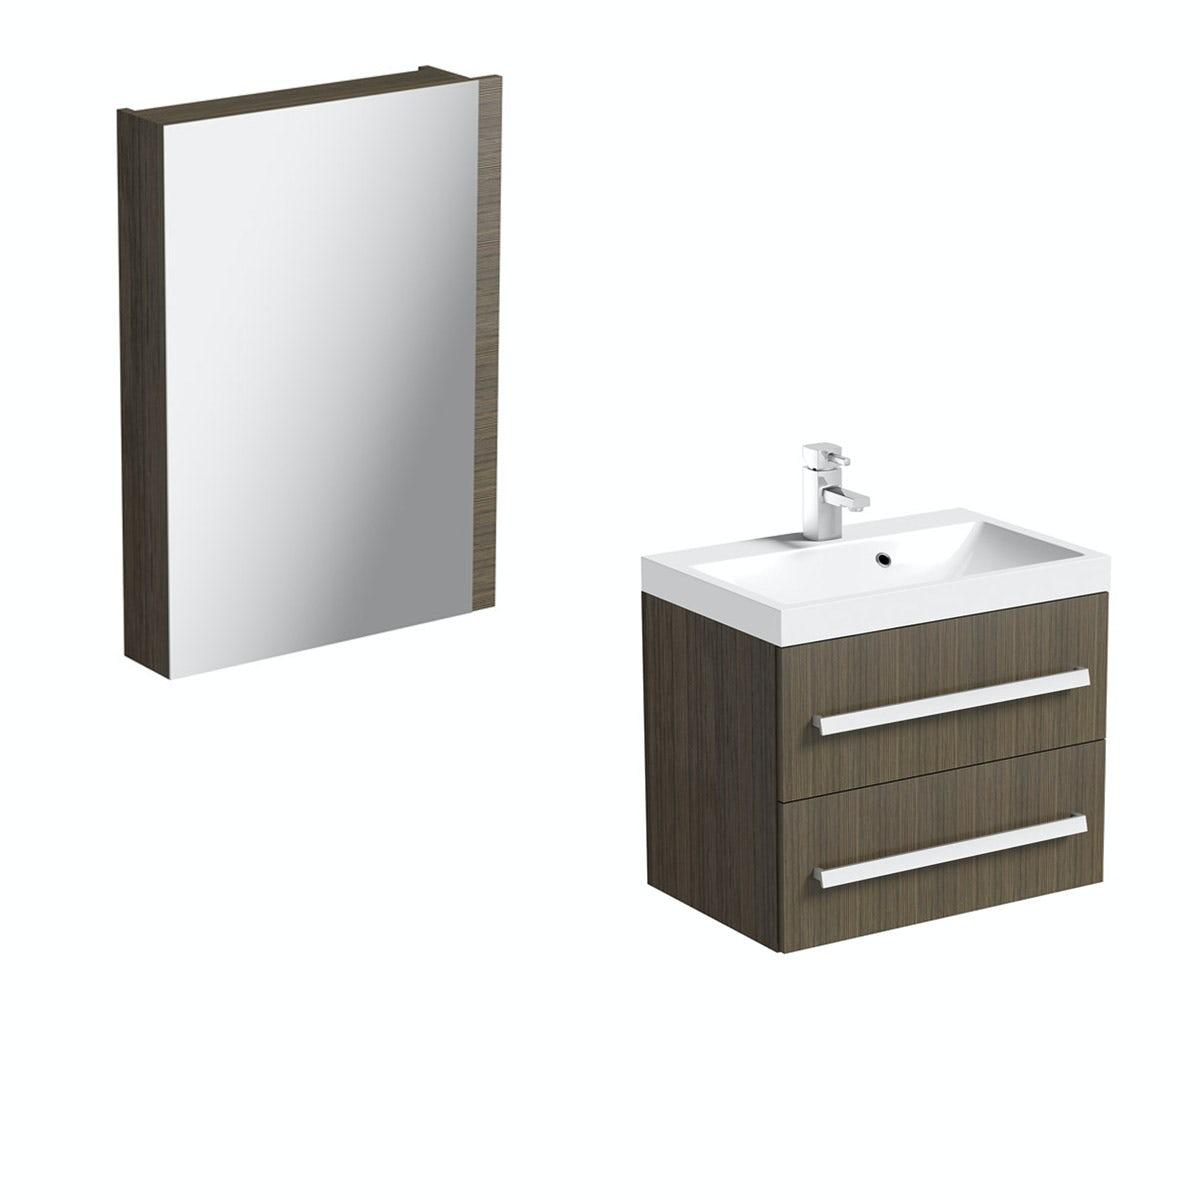 Arden Walnut Wall Hung Vanity Unit With Basin & Mirror - 600mm